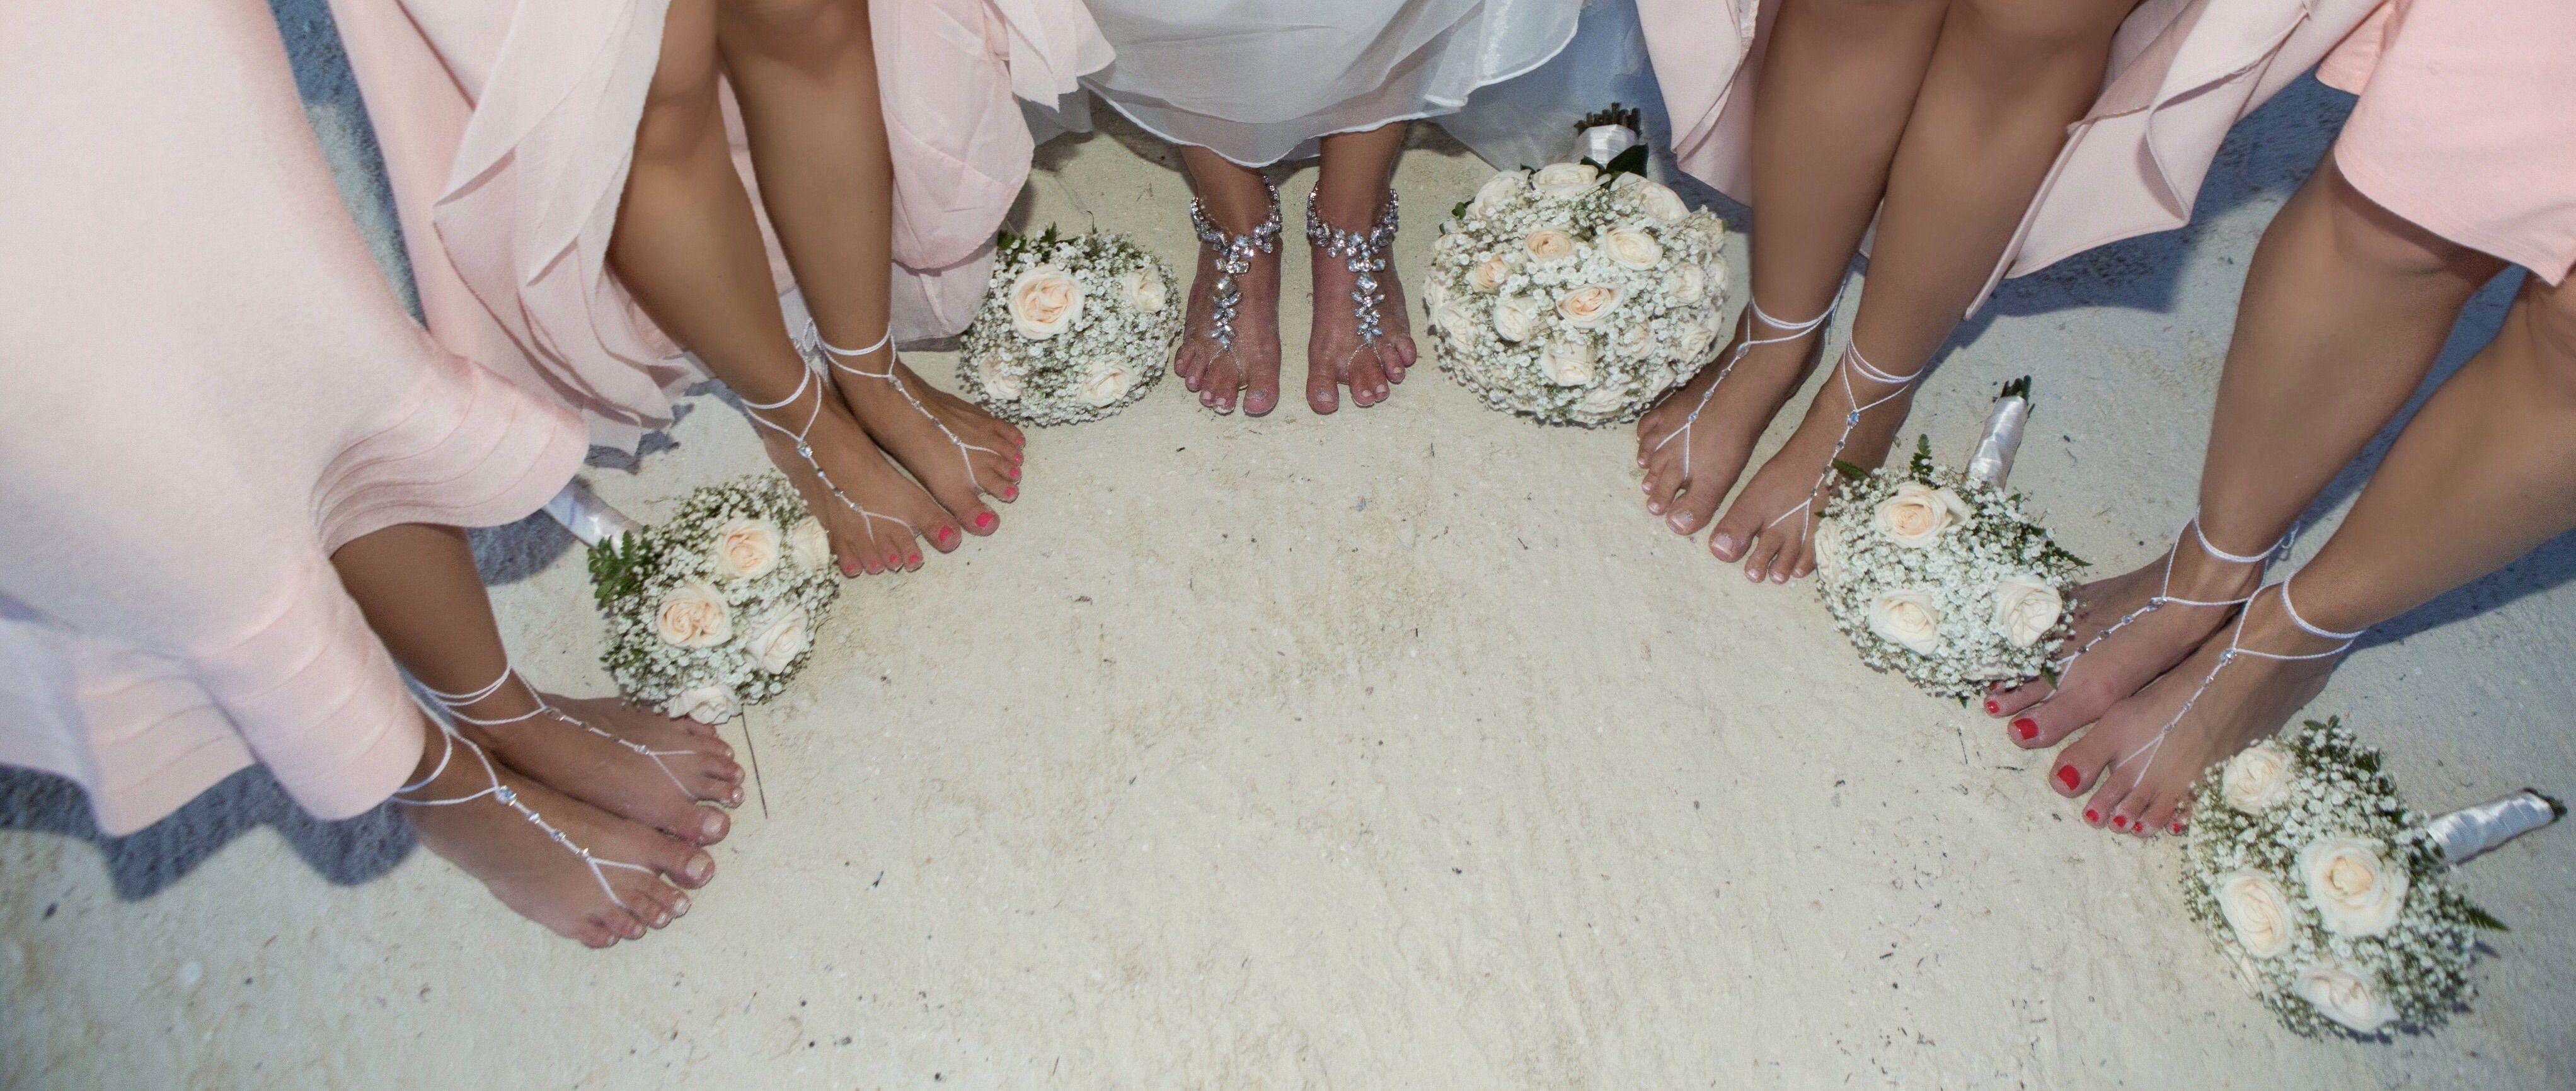 Beach wedding foot jewelry  Barefoot Sandals Bridesmaid Gift Foot Jewelry Beach Wedding